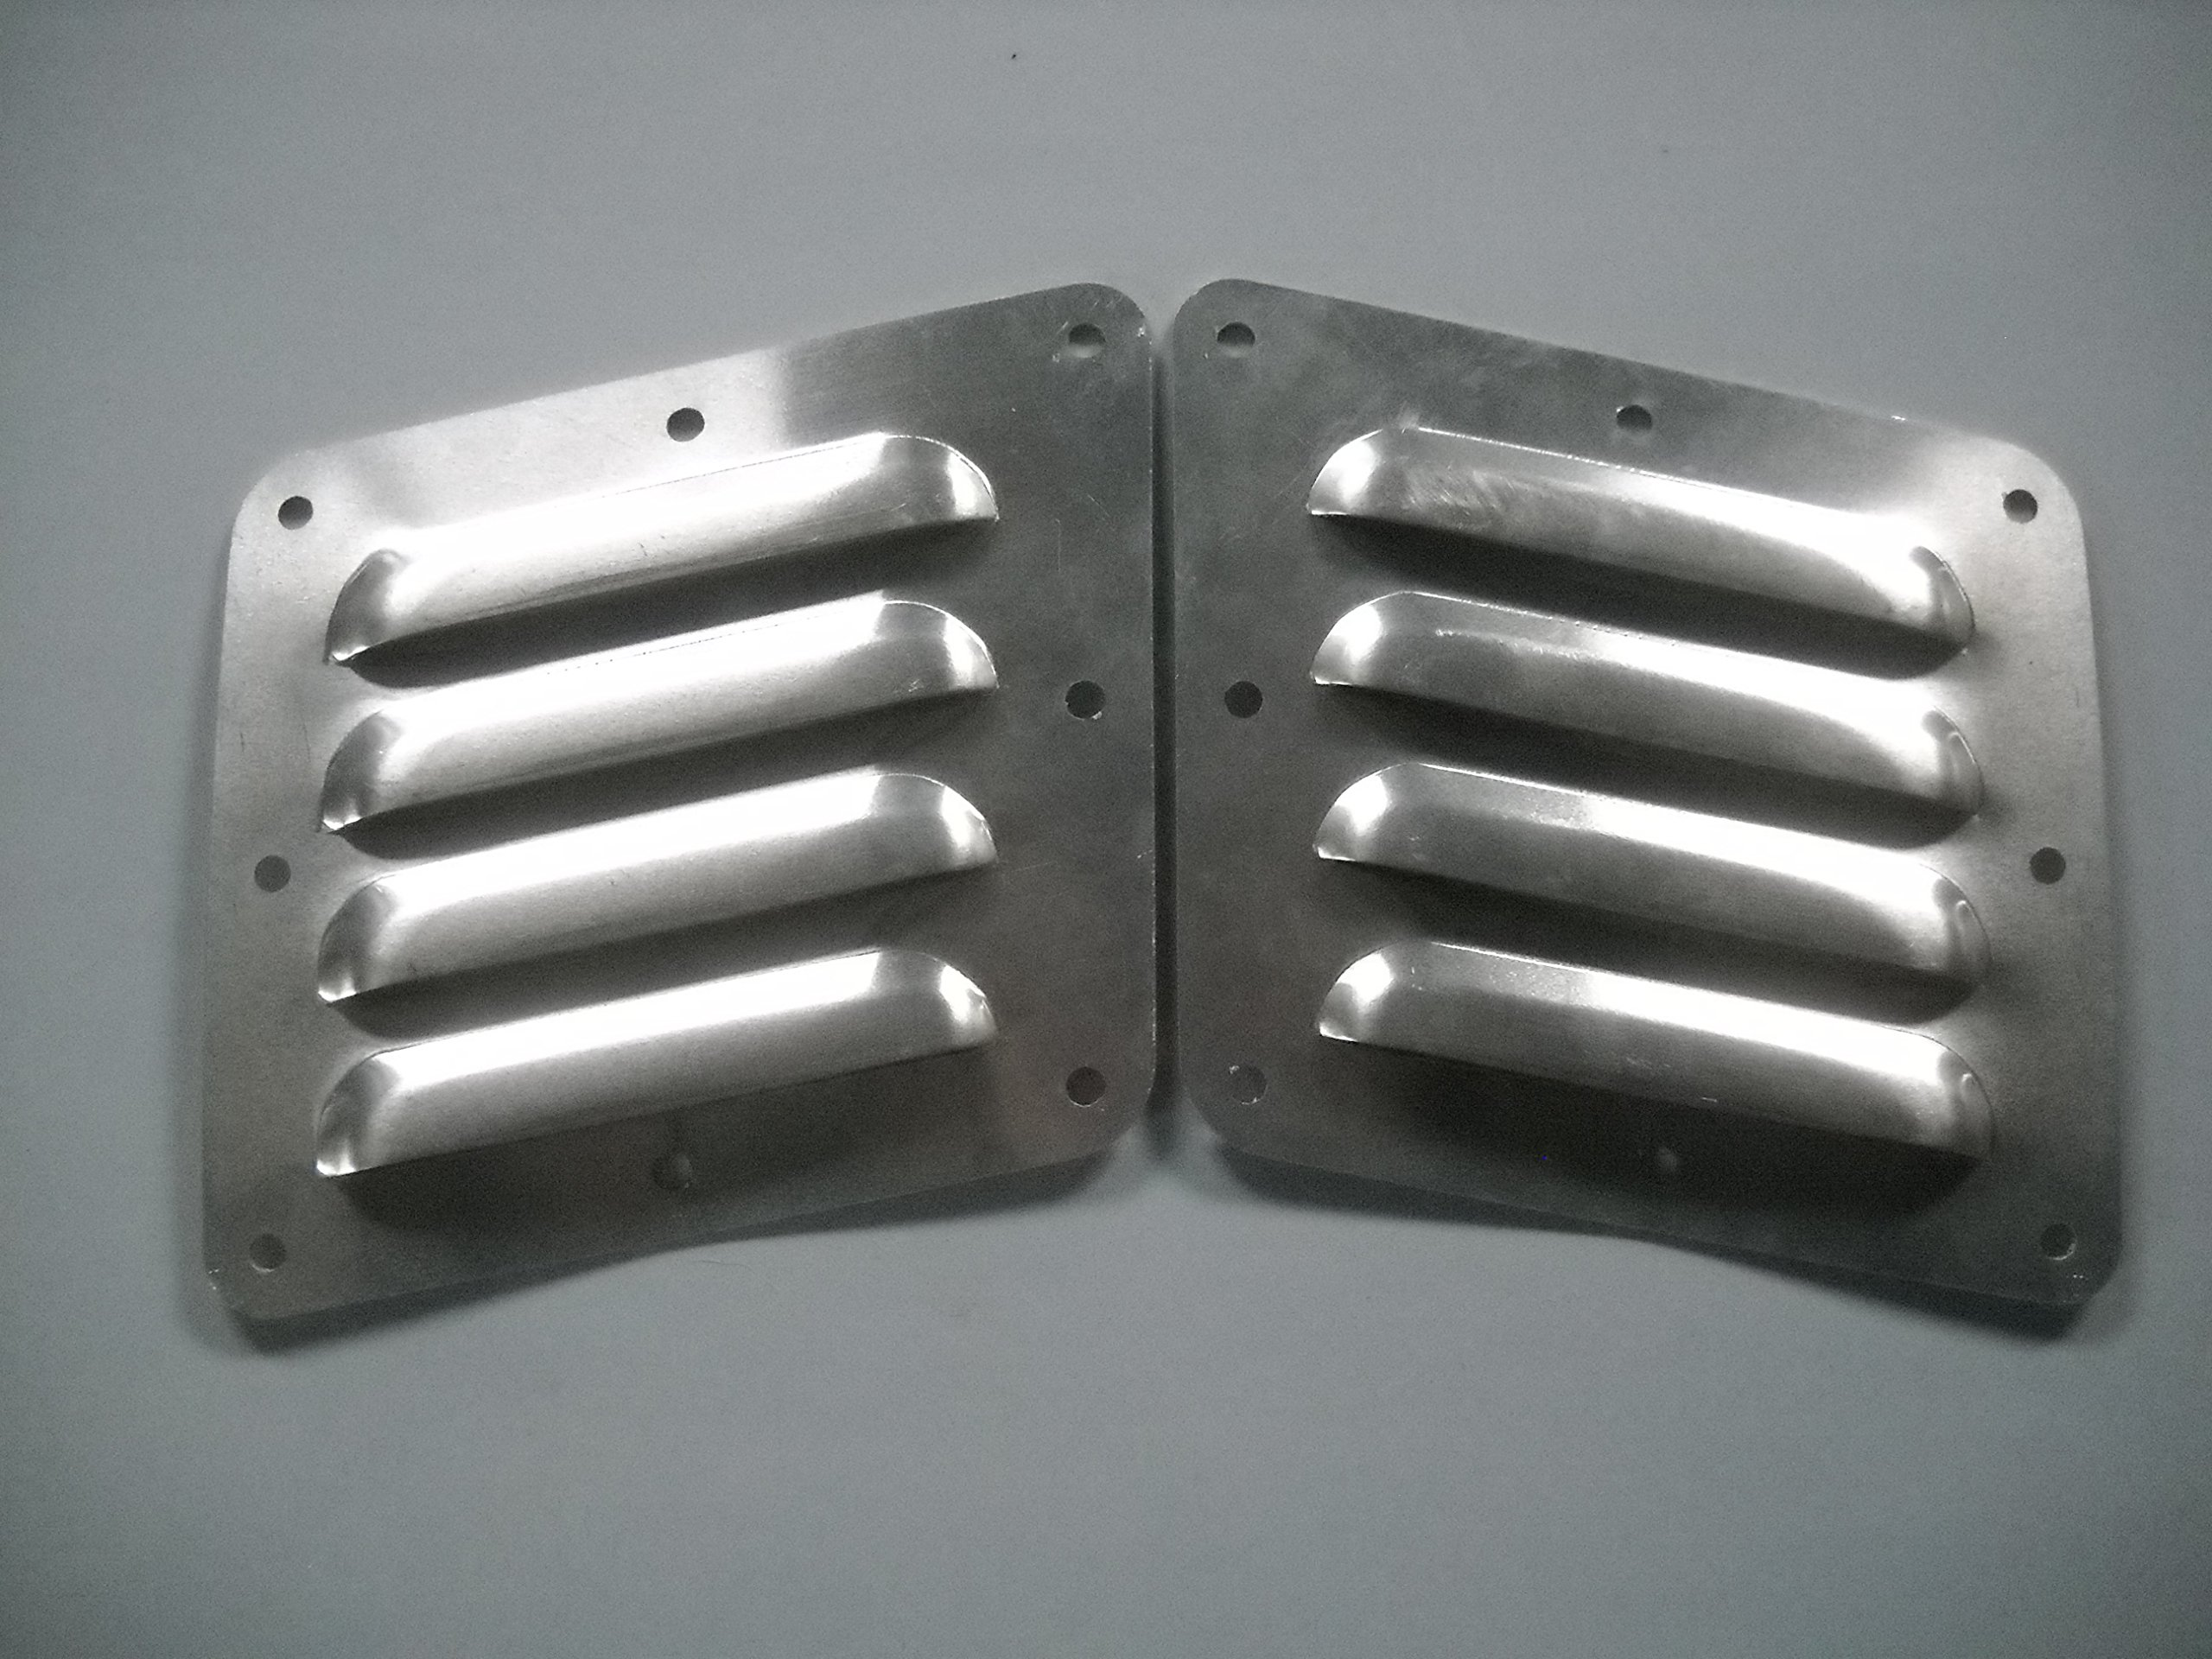 "RodLouvers Pair of Angled Aluminum 5"" 4 Louver Hood Panels (Bolt-On) Kit"